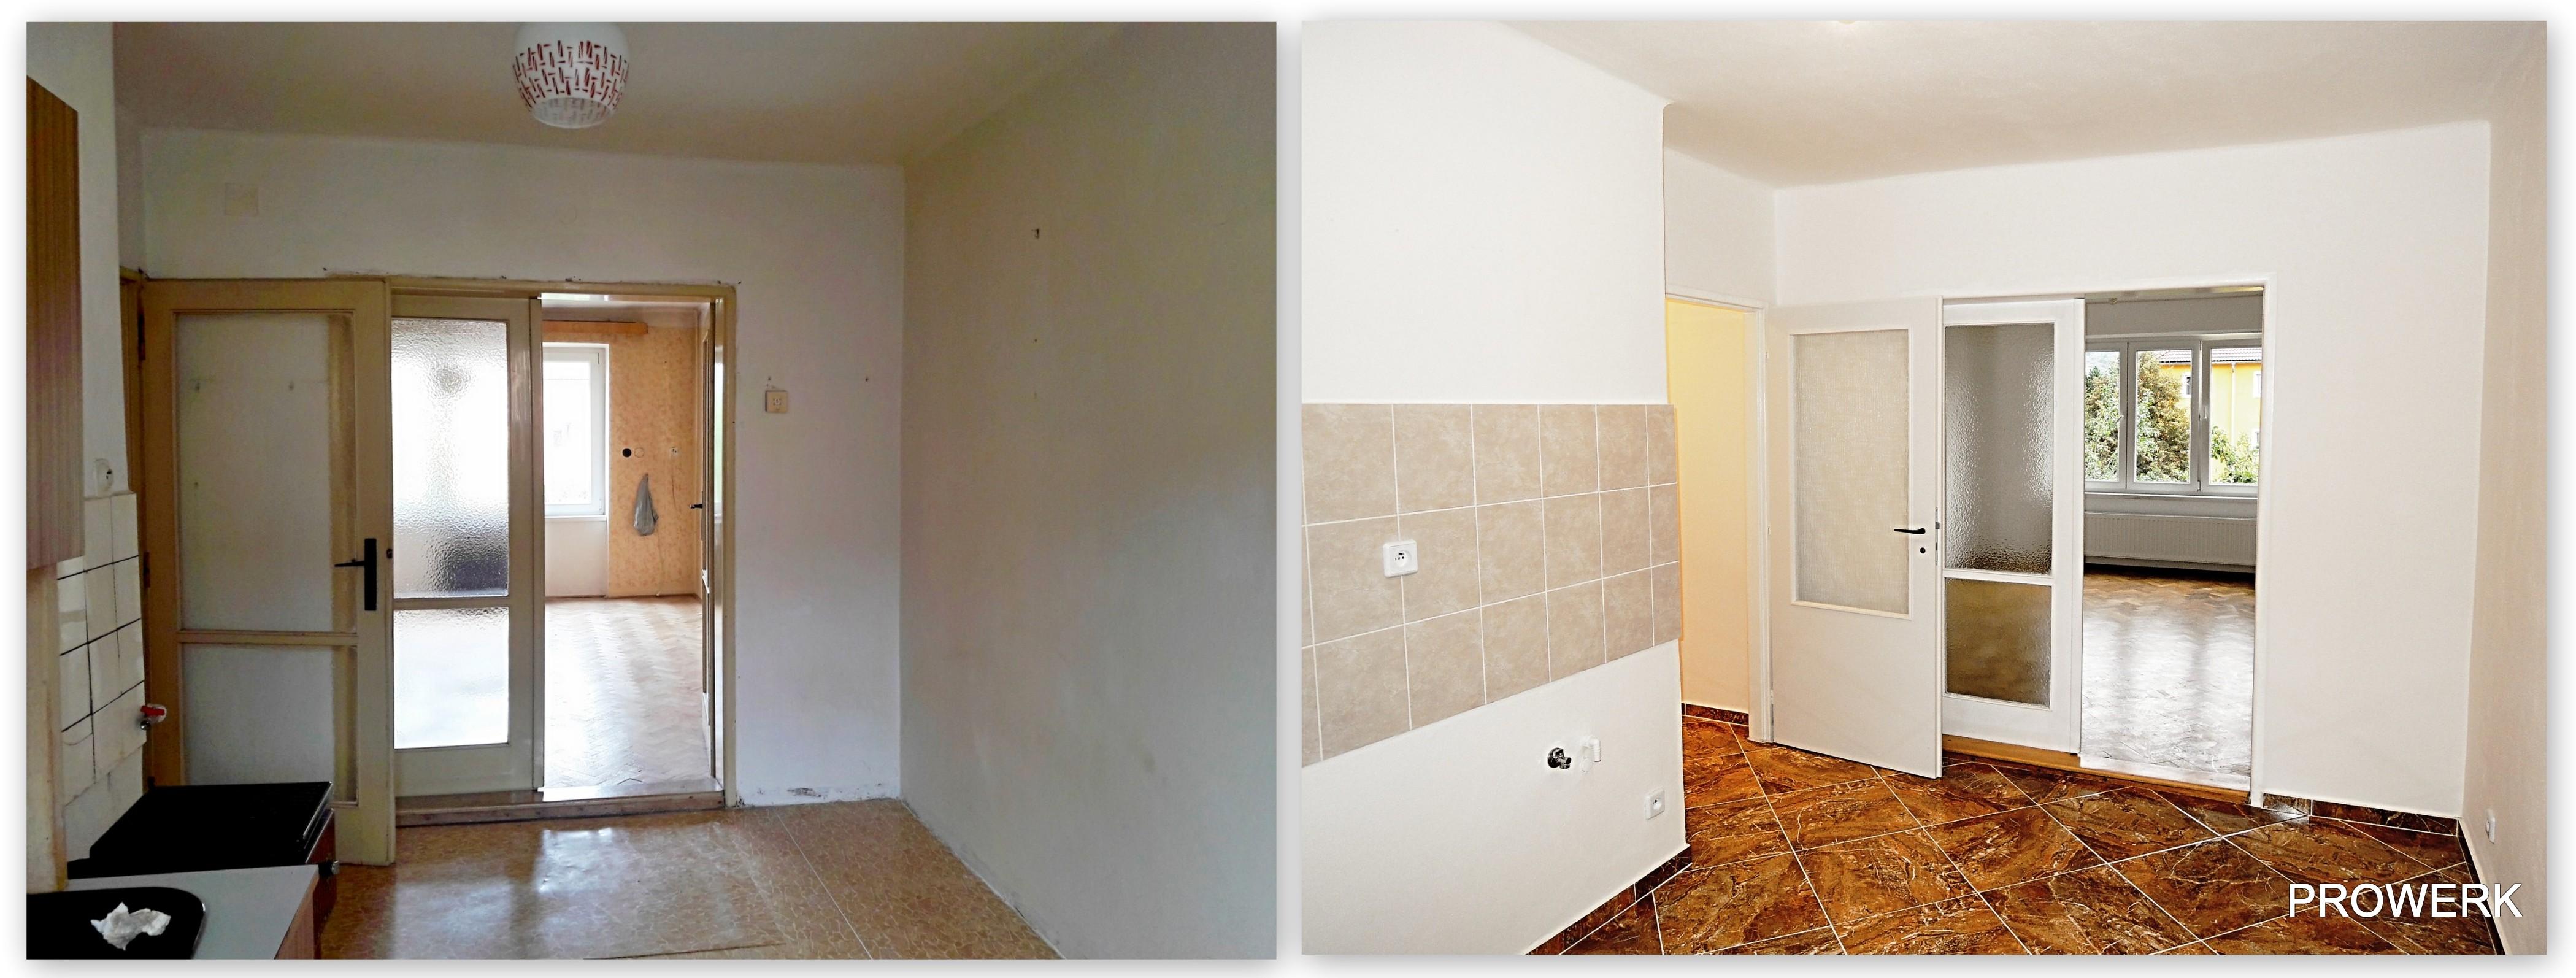 rekonstrukce_bytu_prowerk_podlahy